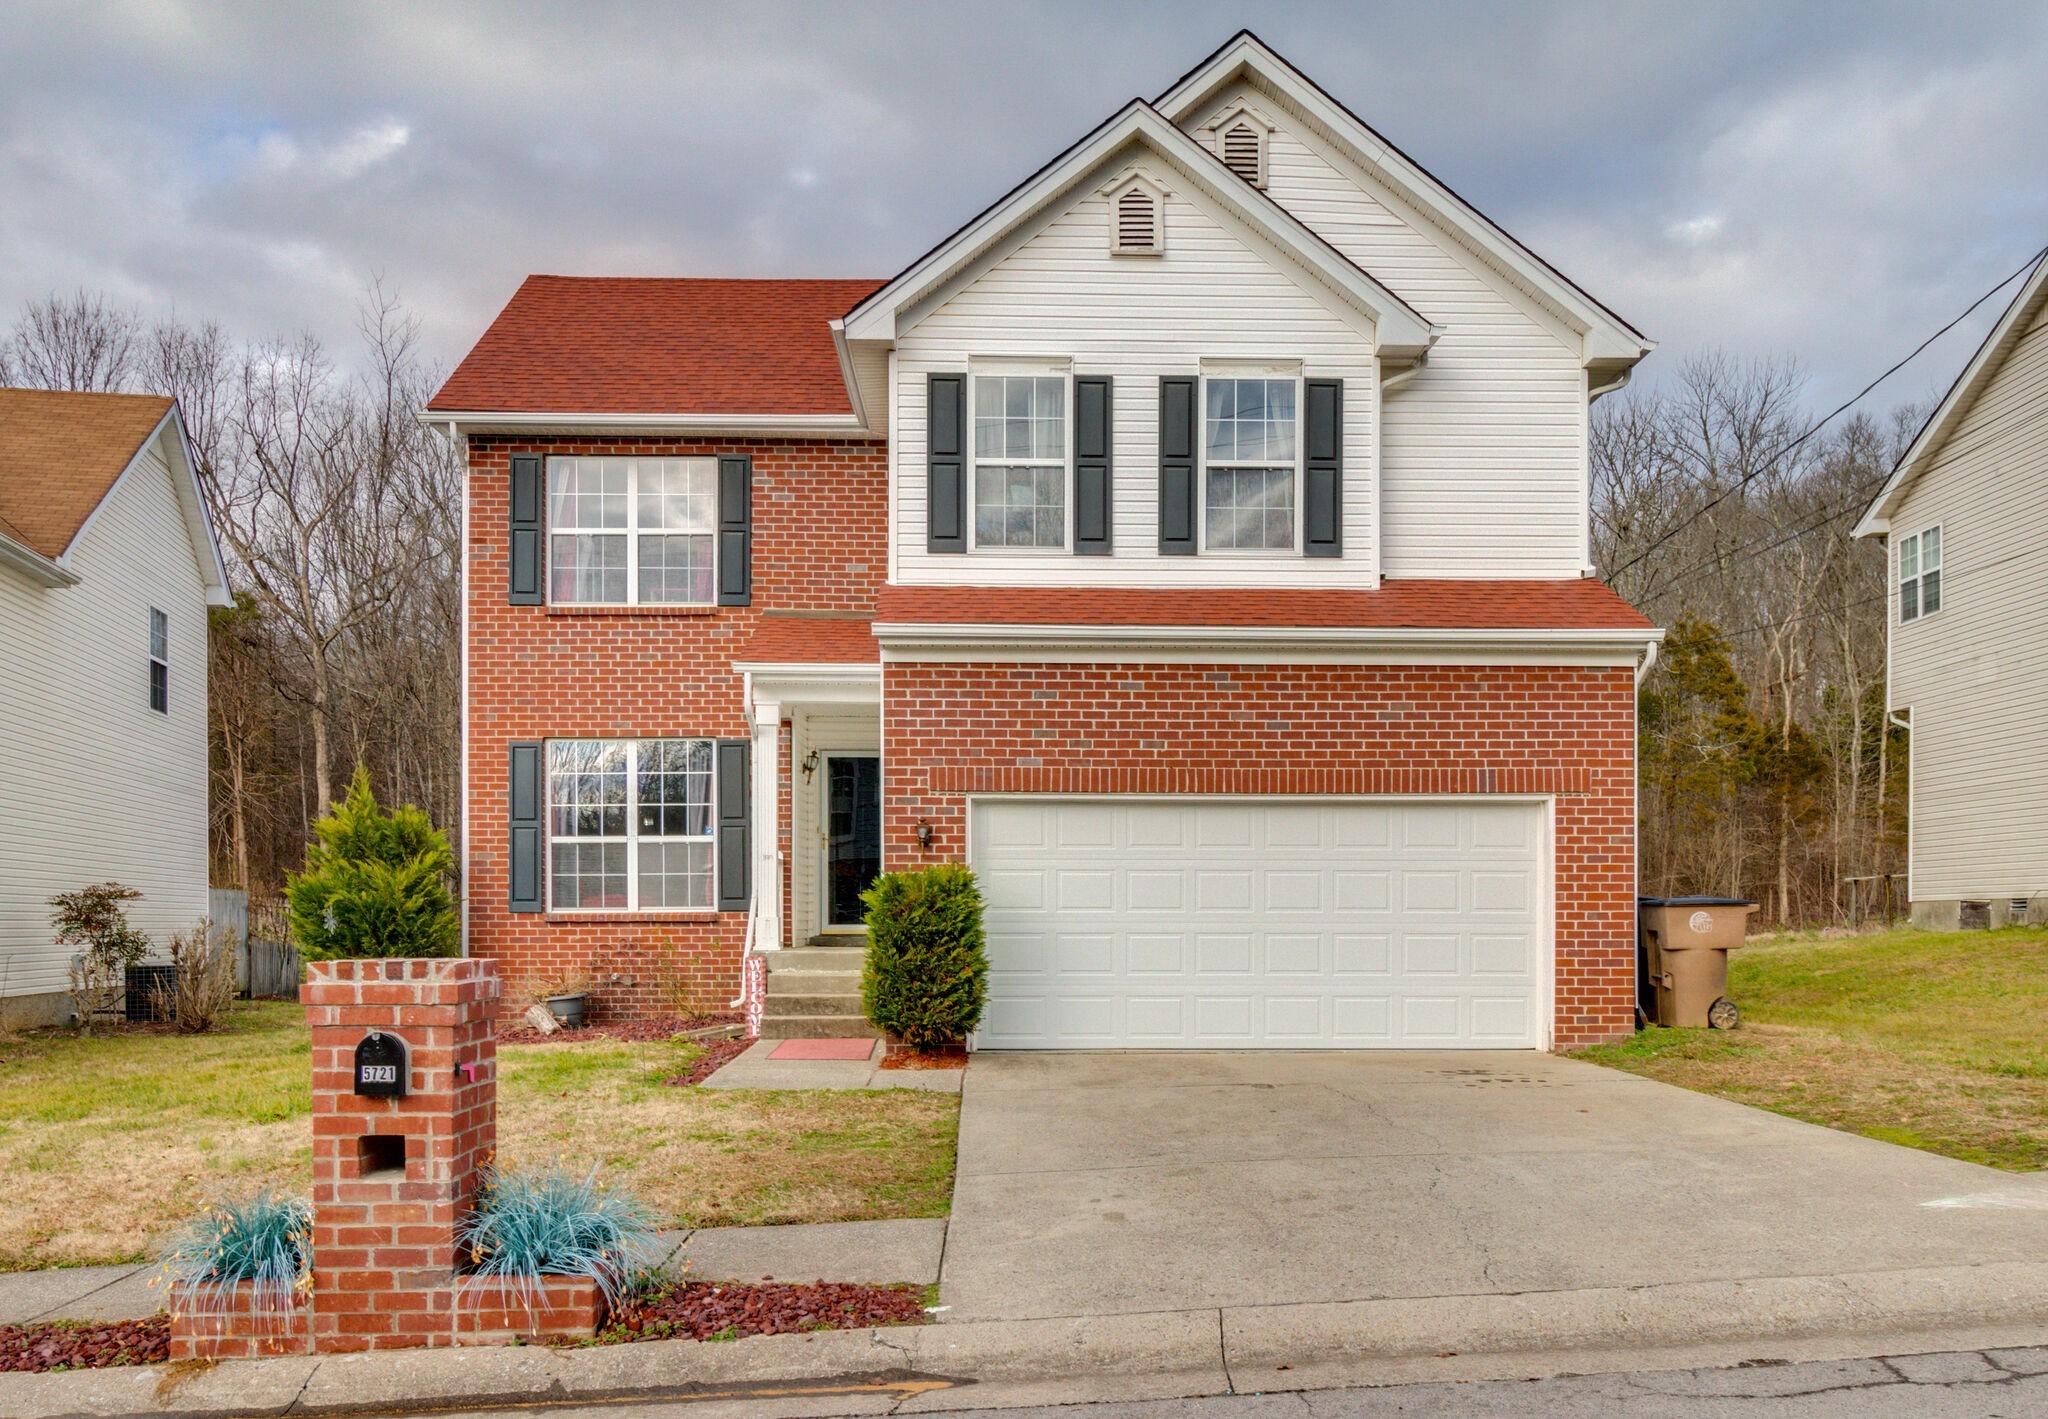 5721 Cedar Ash Xing Property Photo - Antioch, TN real estate listing